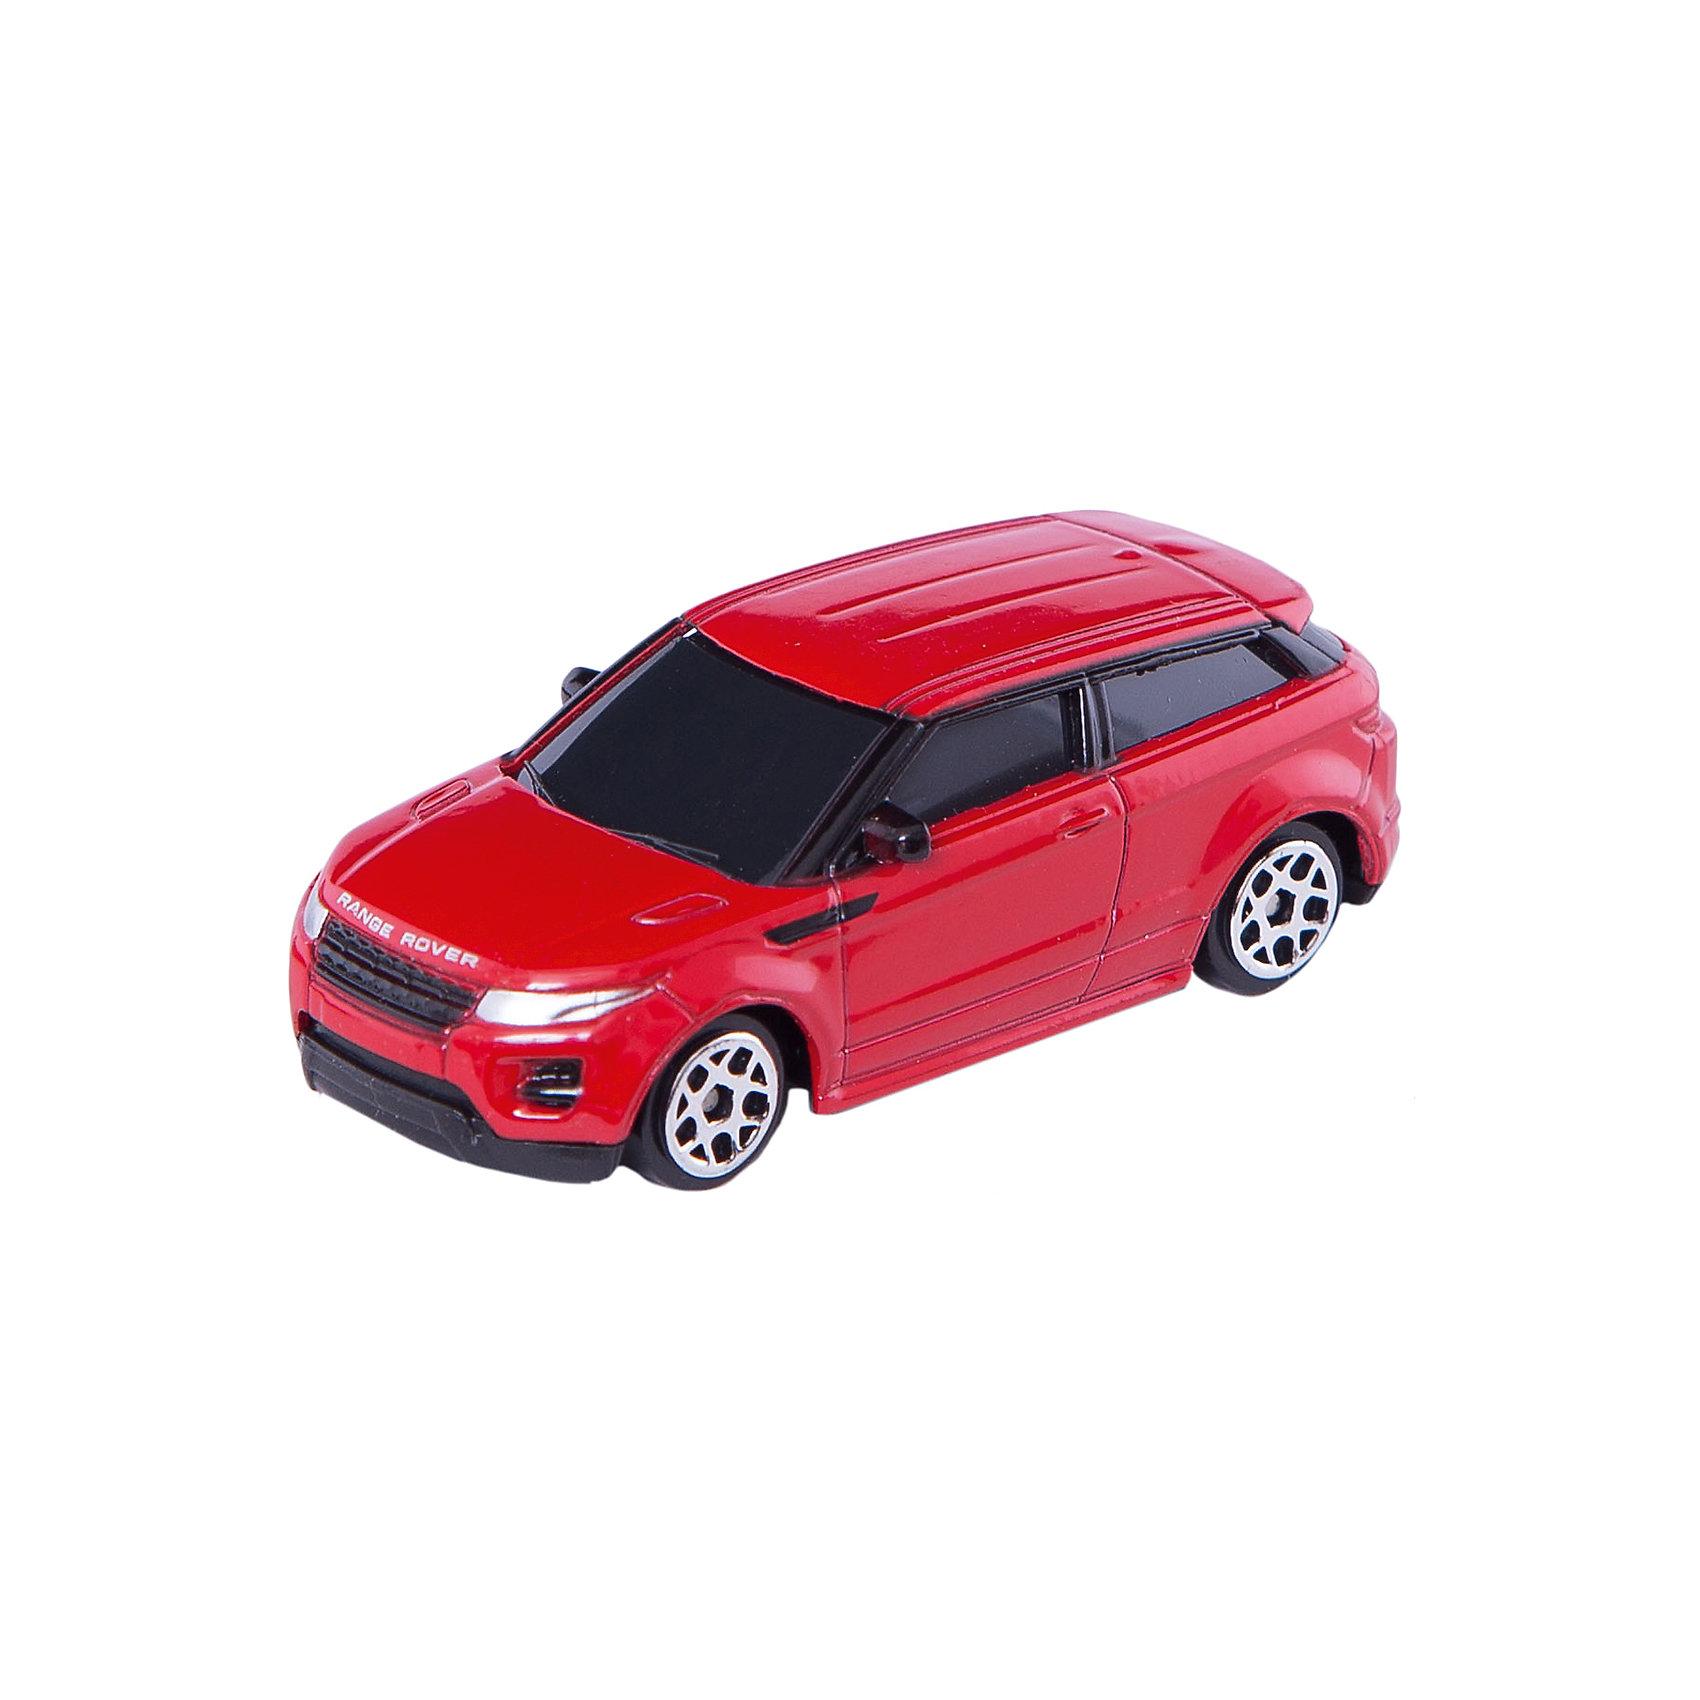 Машинка Range Rover Evoque Jeans 3, AutotimeМашинки<br><br><br>Ширина мм: 90<br>Глубина мм: 42<br>Высота мм: 40<br>Вес г: 14<br>Возраст от месяцев: 36<br>Возраст до месяцев: 2147483647<br>Пол: Мужской<br>Возраст: Детский<br>SKU: 5584073